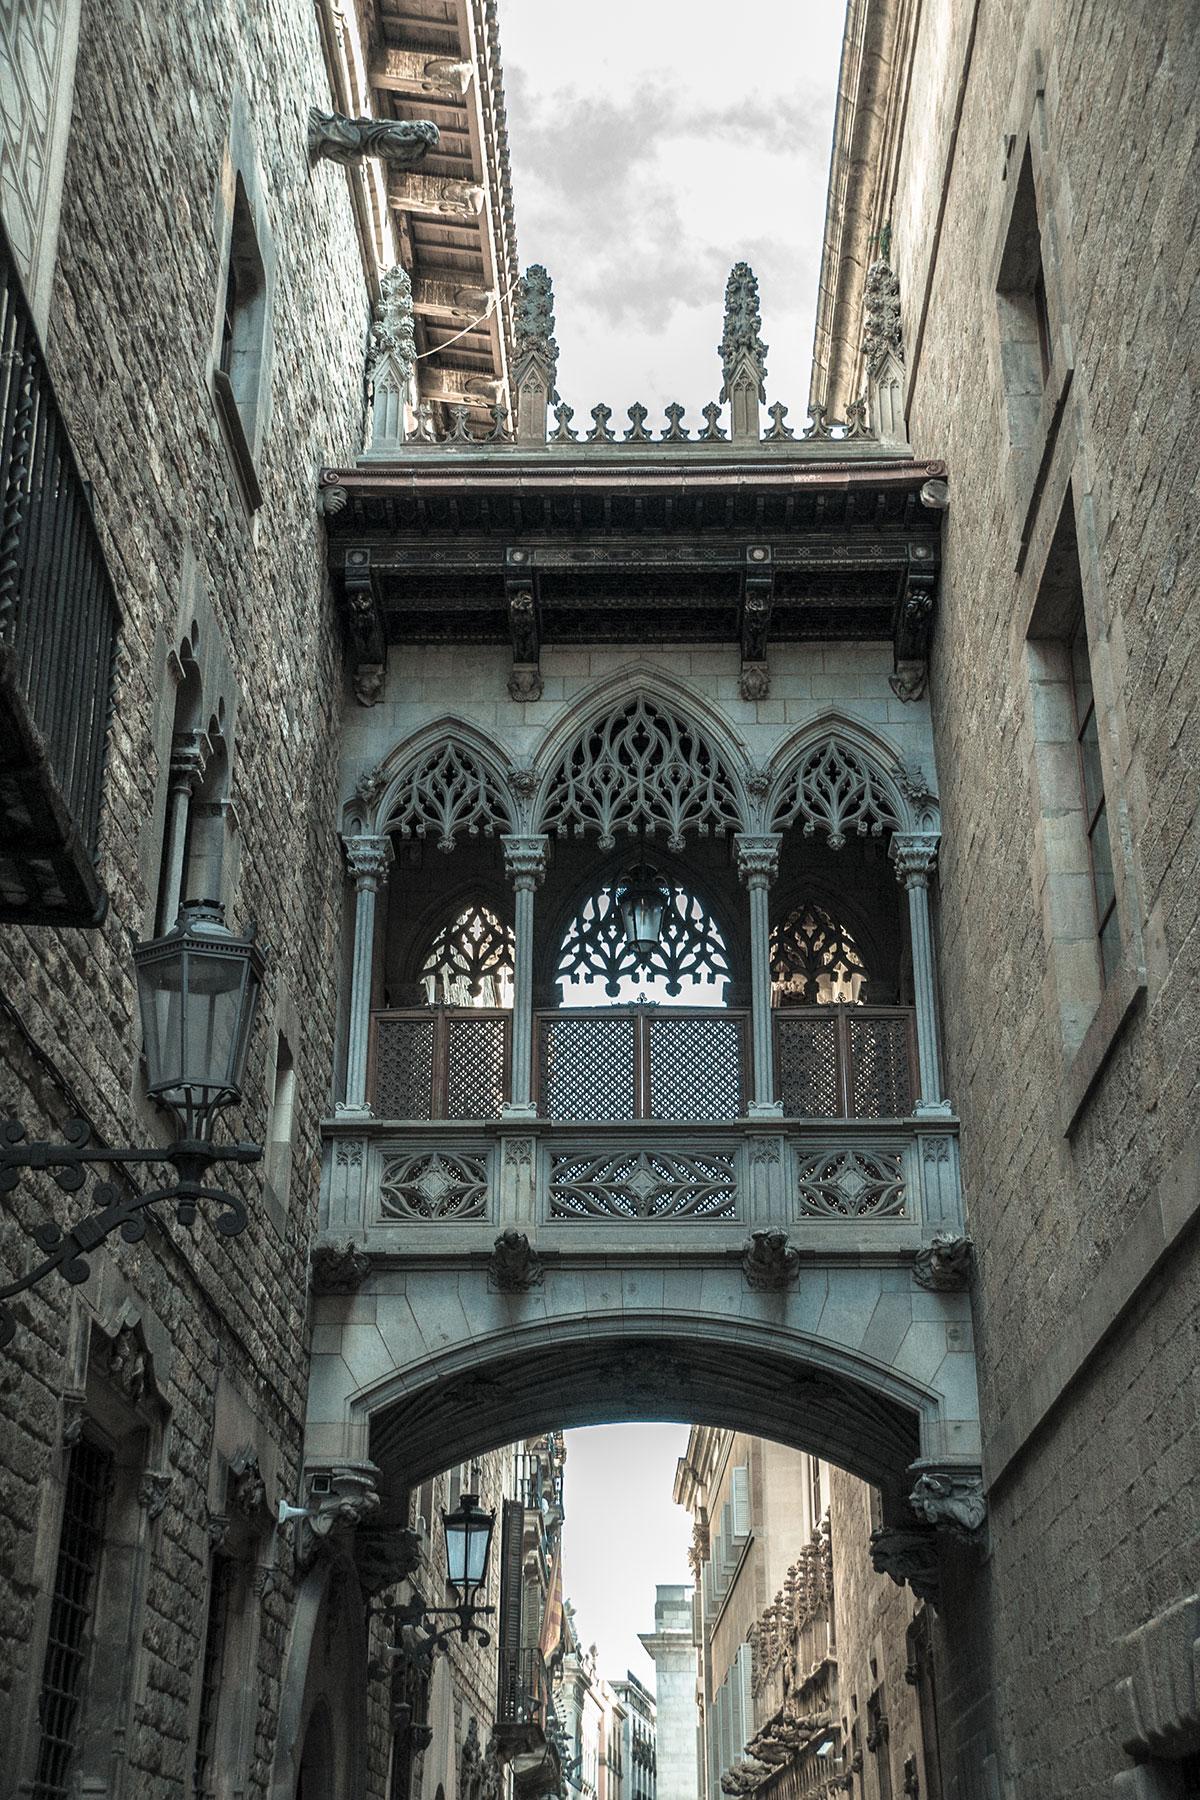 Barcelona - Barri Gotic